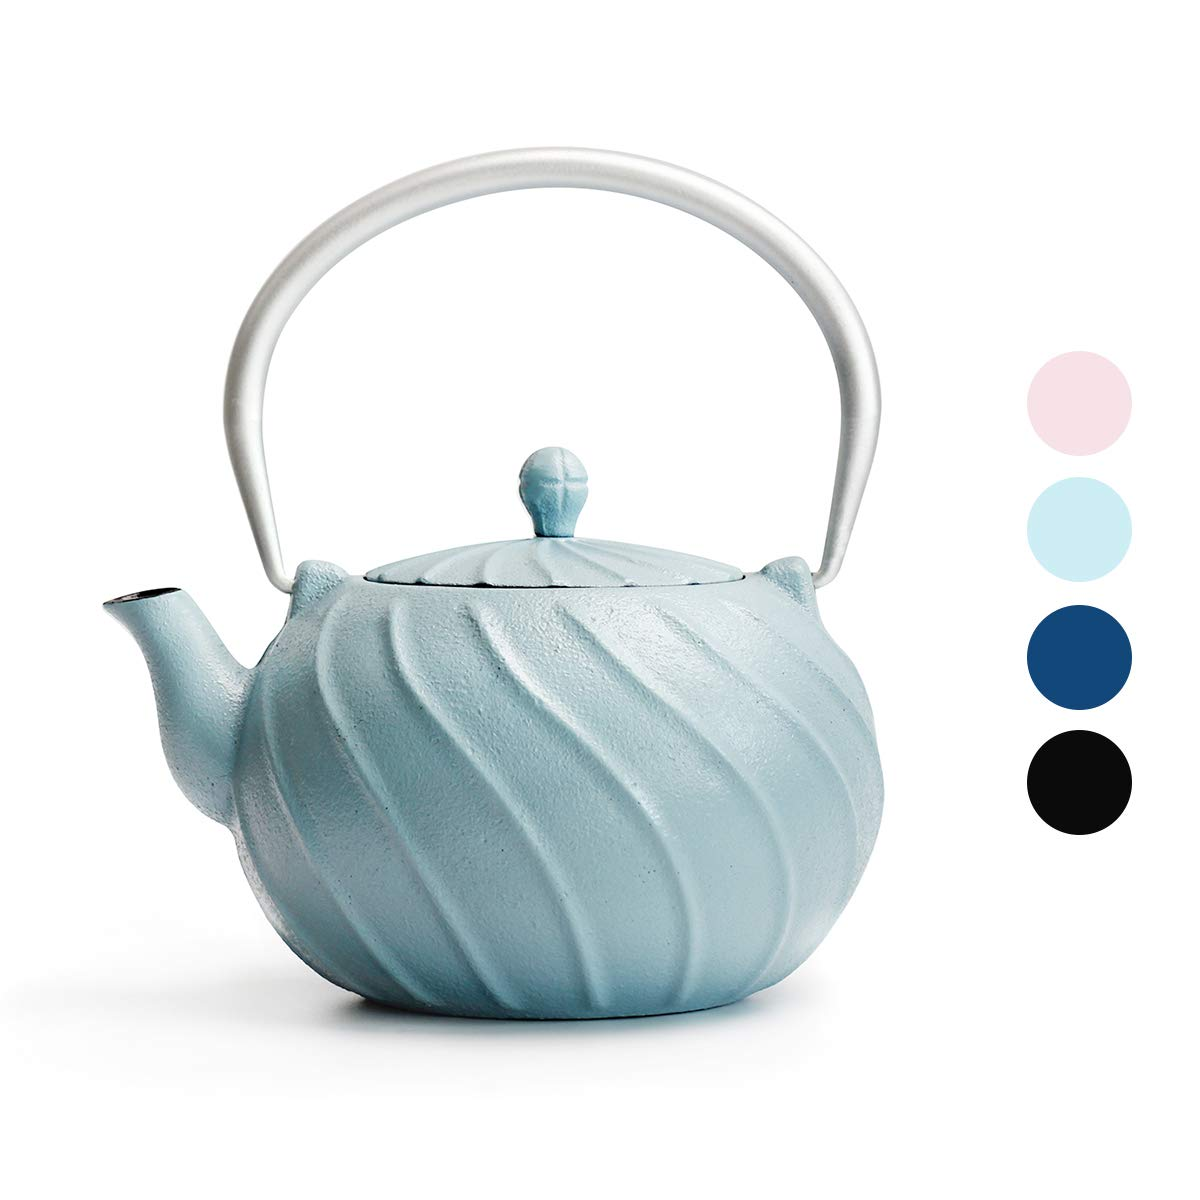 Tea Kettle, TOPTIER Japanese Cast Iron Tea Kettle with Infuser, Stovetop Safe Cast Iron Tea Kettle, Wave Design Cast Iron Teapot Coated with Enameled Interior for 22 oz (650 ml), Turquoise Blue